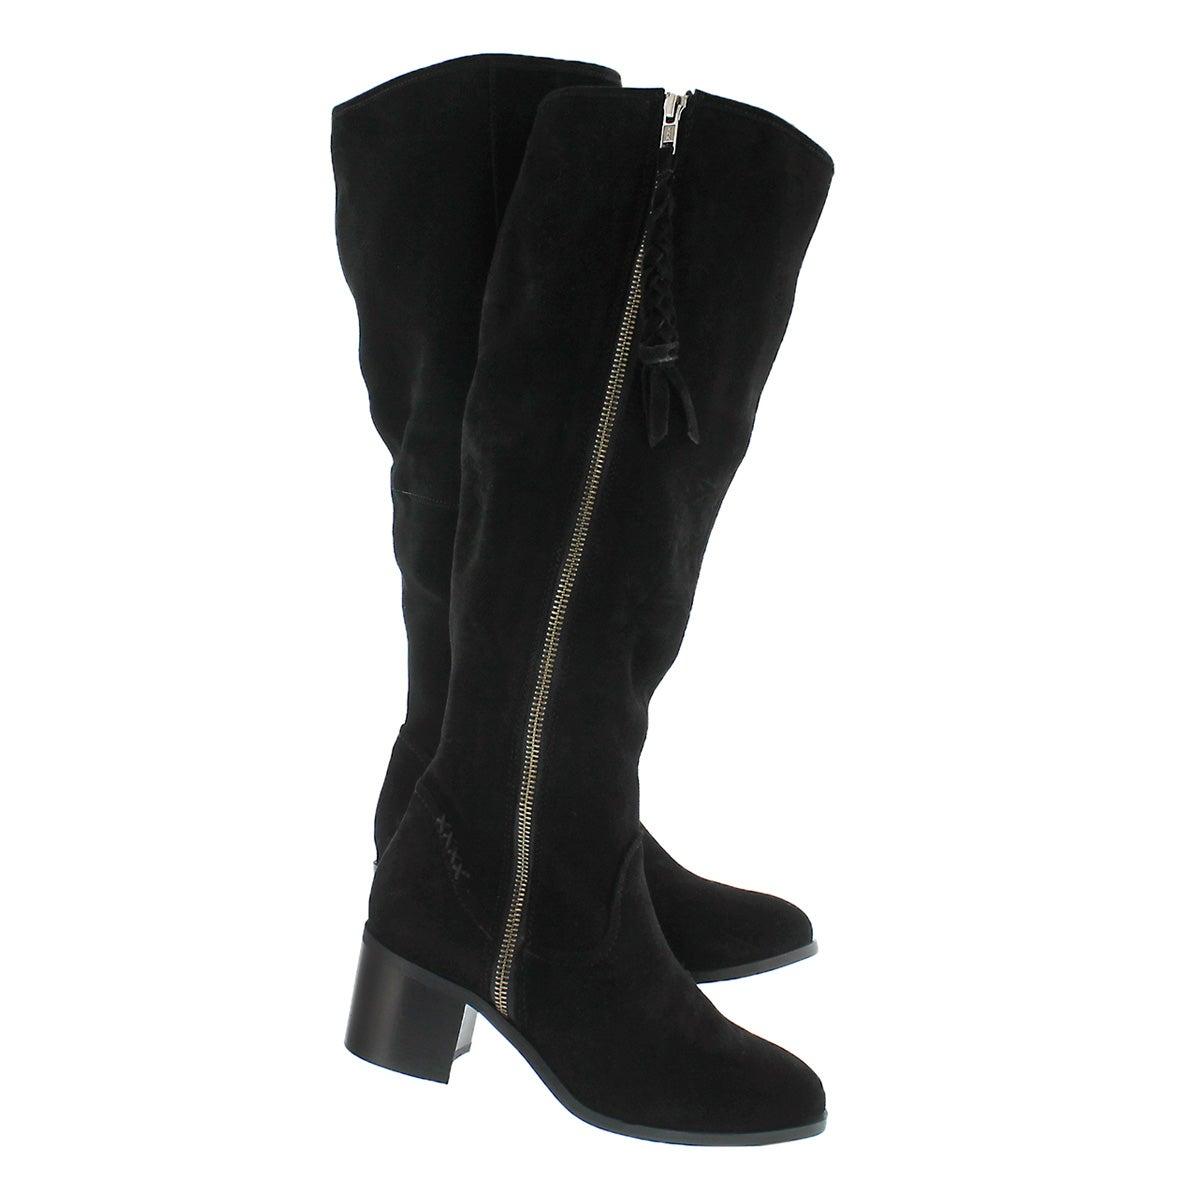 Lds Lasso black knee high dress boot